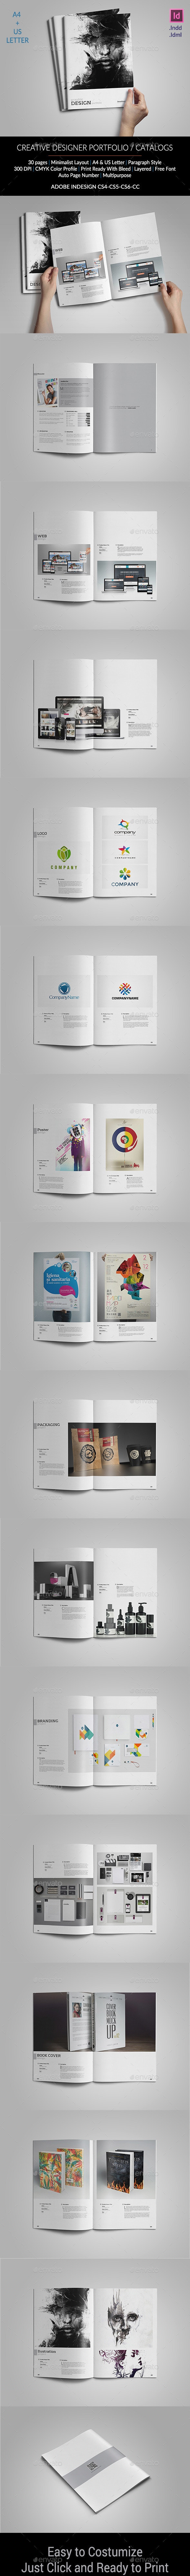 Creative Designer Portfolio - Portfolio Brochures